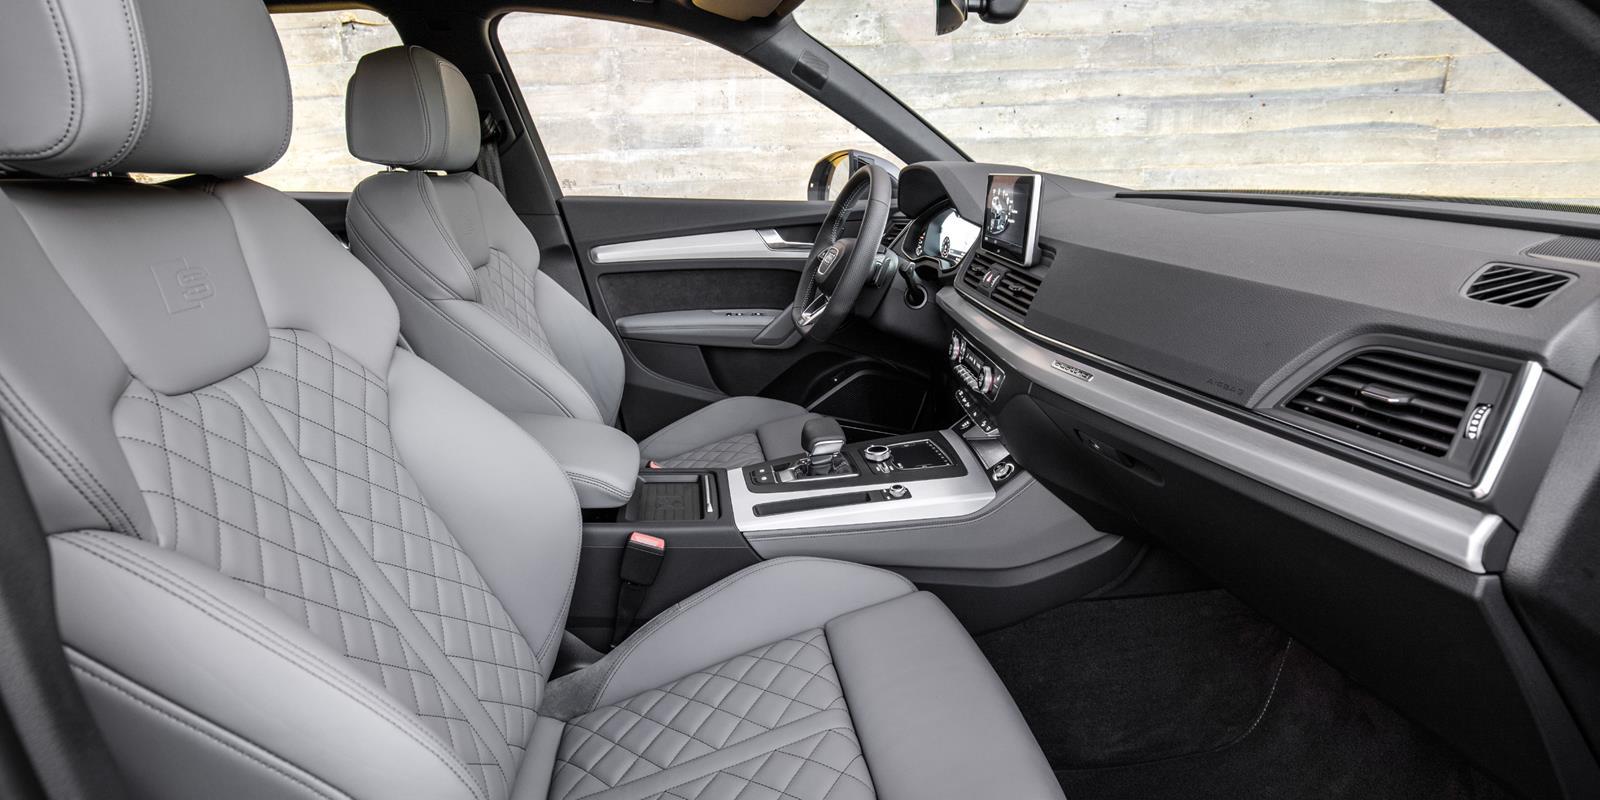 Audi Q5 photo 171923